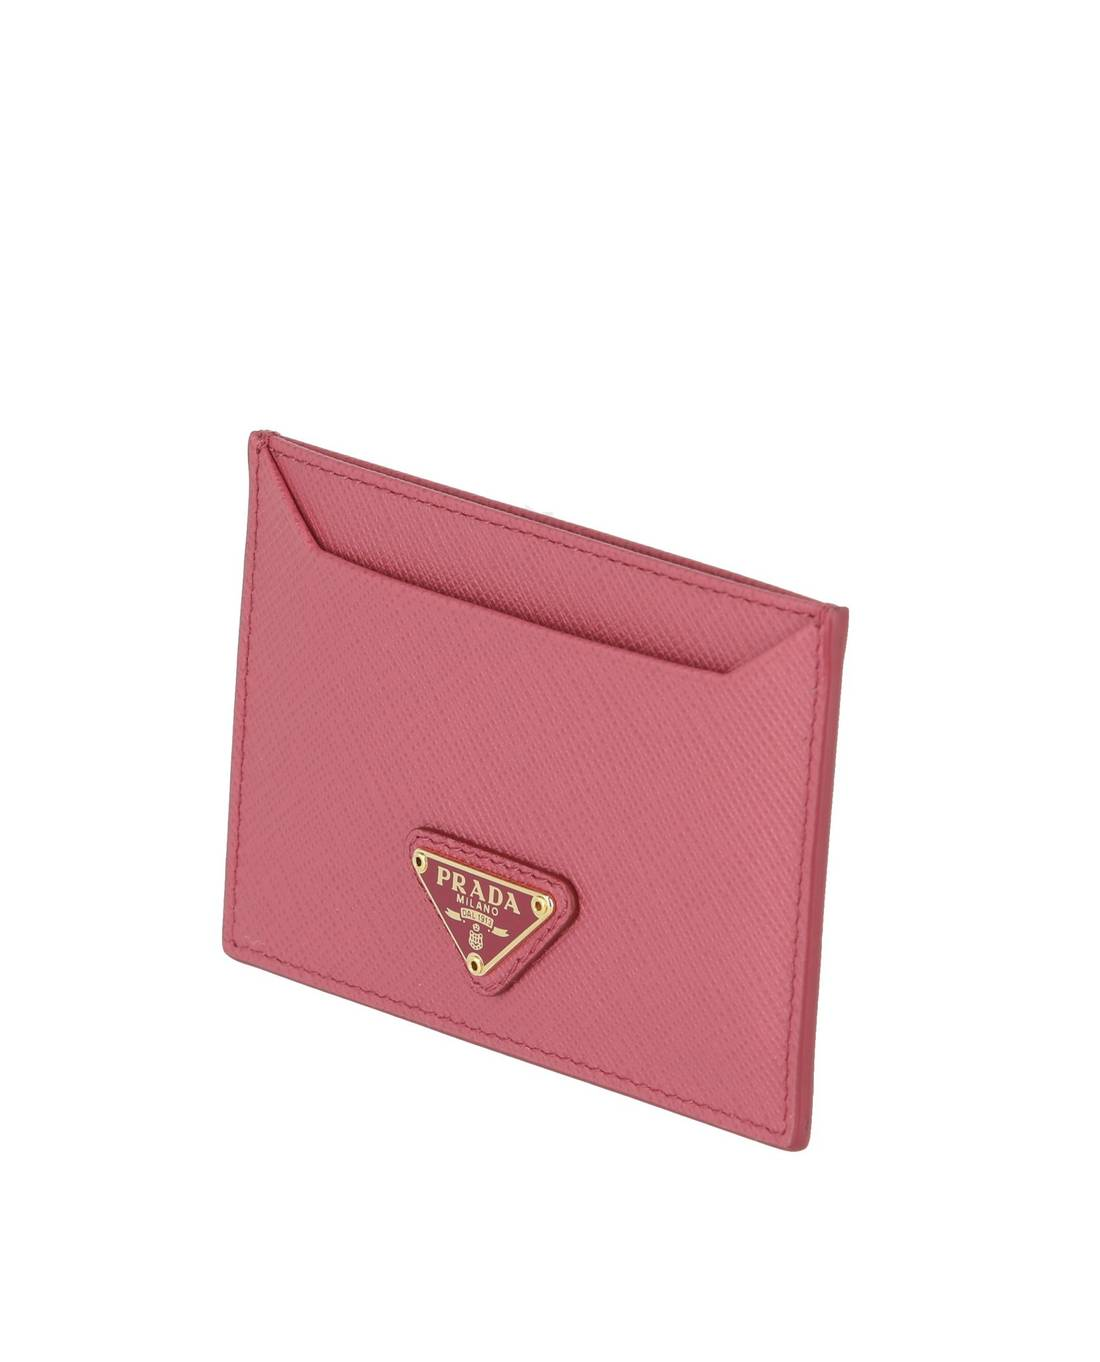 e47db621576083 reduced prada card holders purple pink b7f06 ae6f2